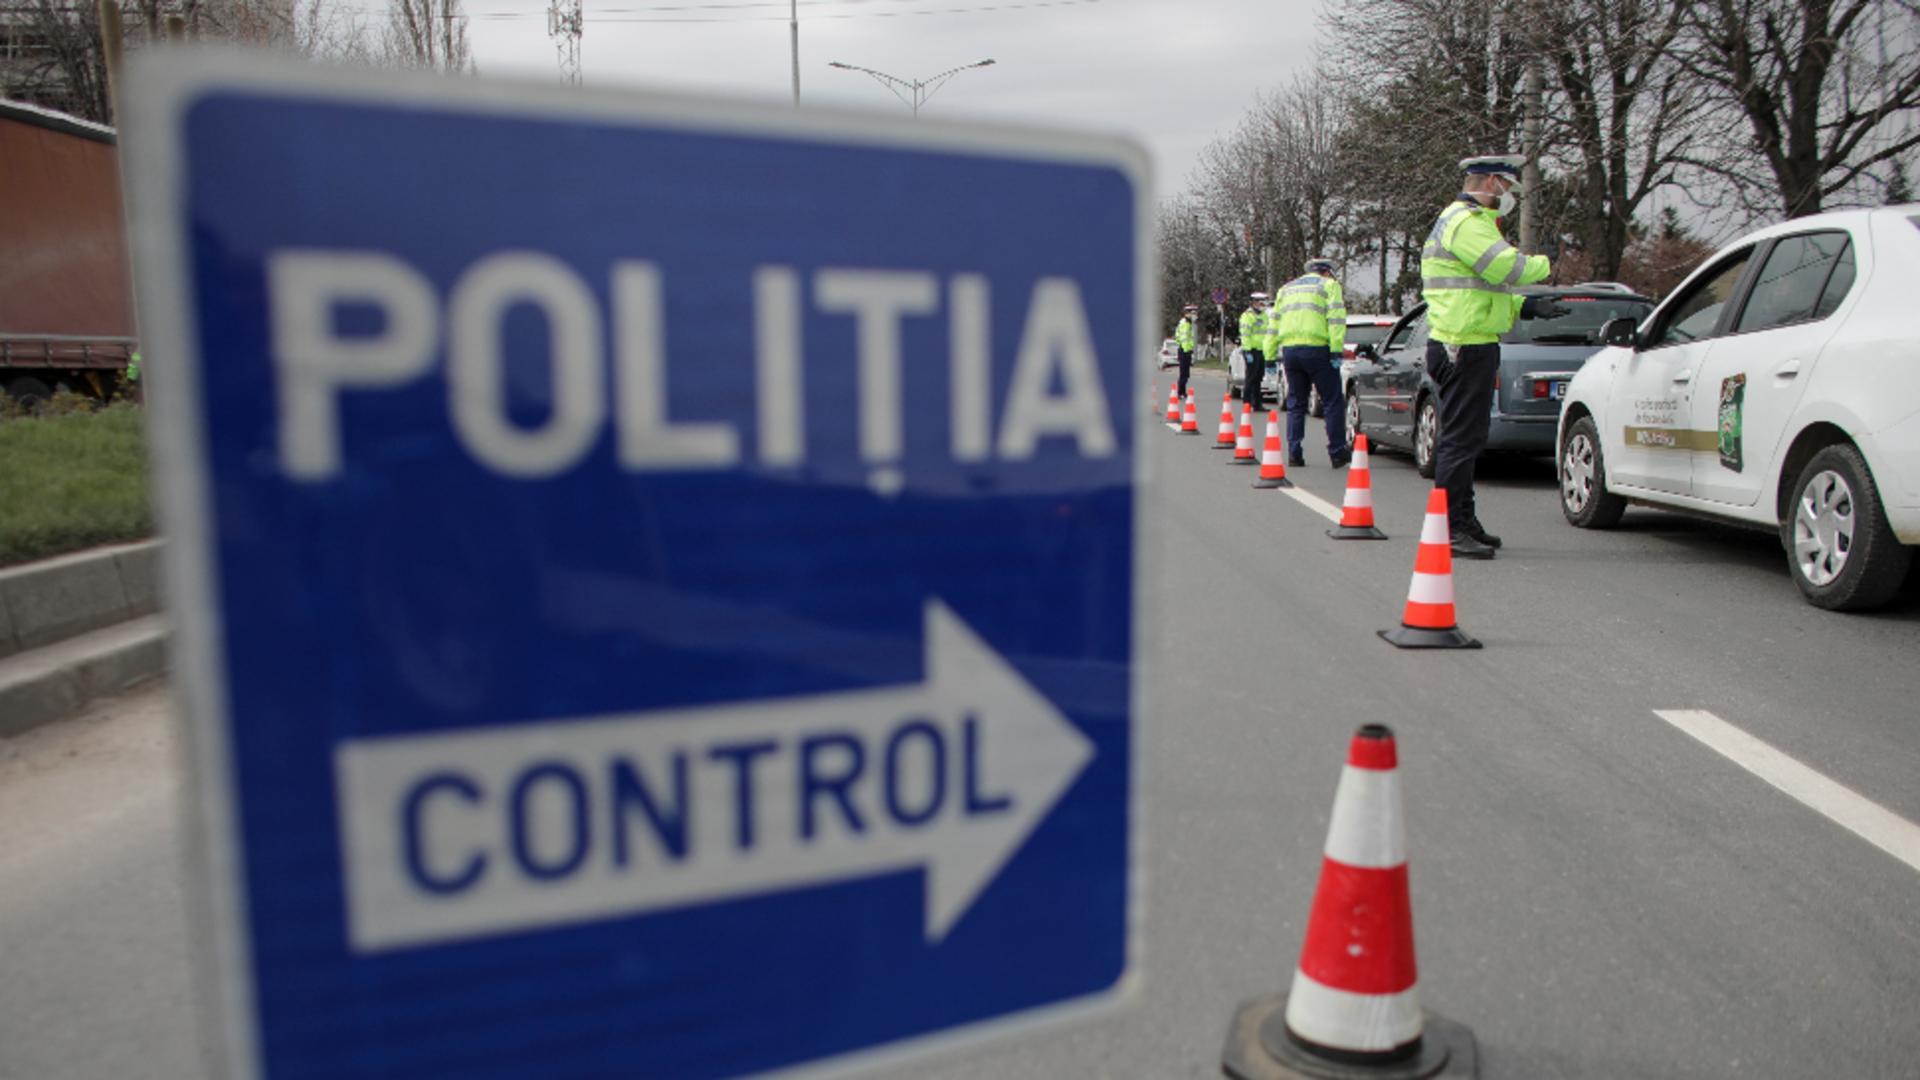 România ar putea scăpa de restricţii începând cu 1 iunie / Foto: Inquam Photos